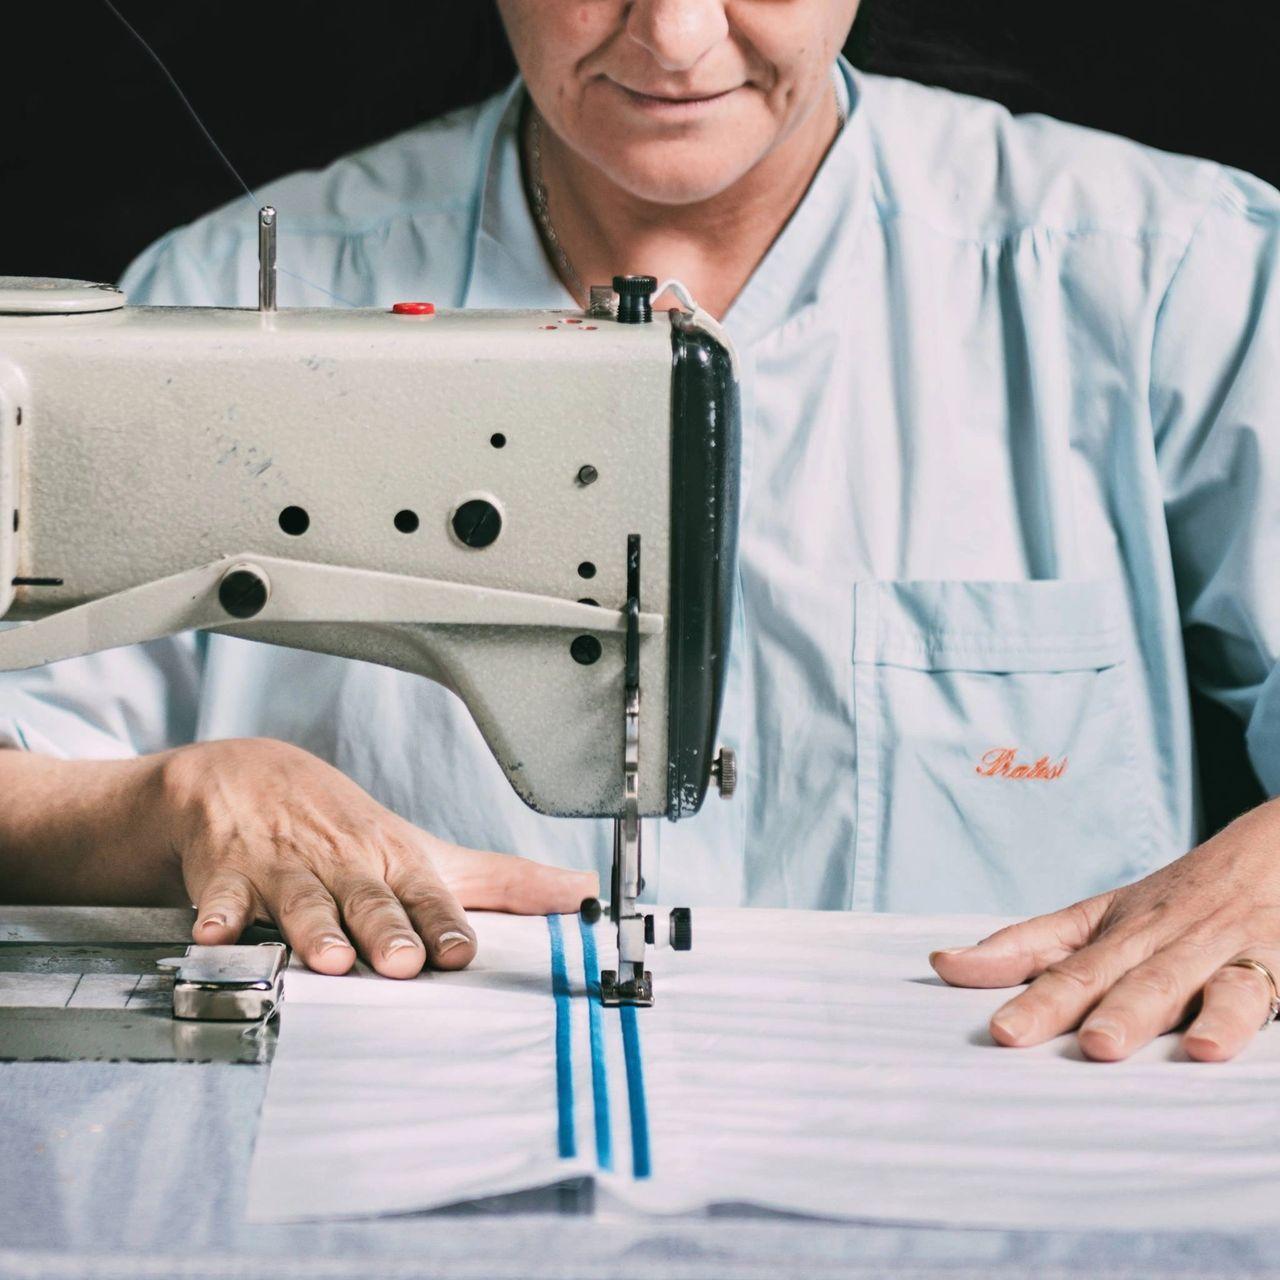 Manufacturing process of PRATESI pillow case